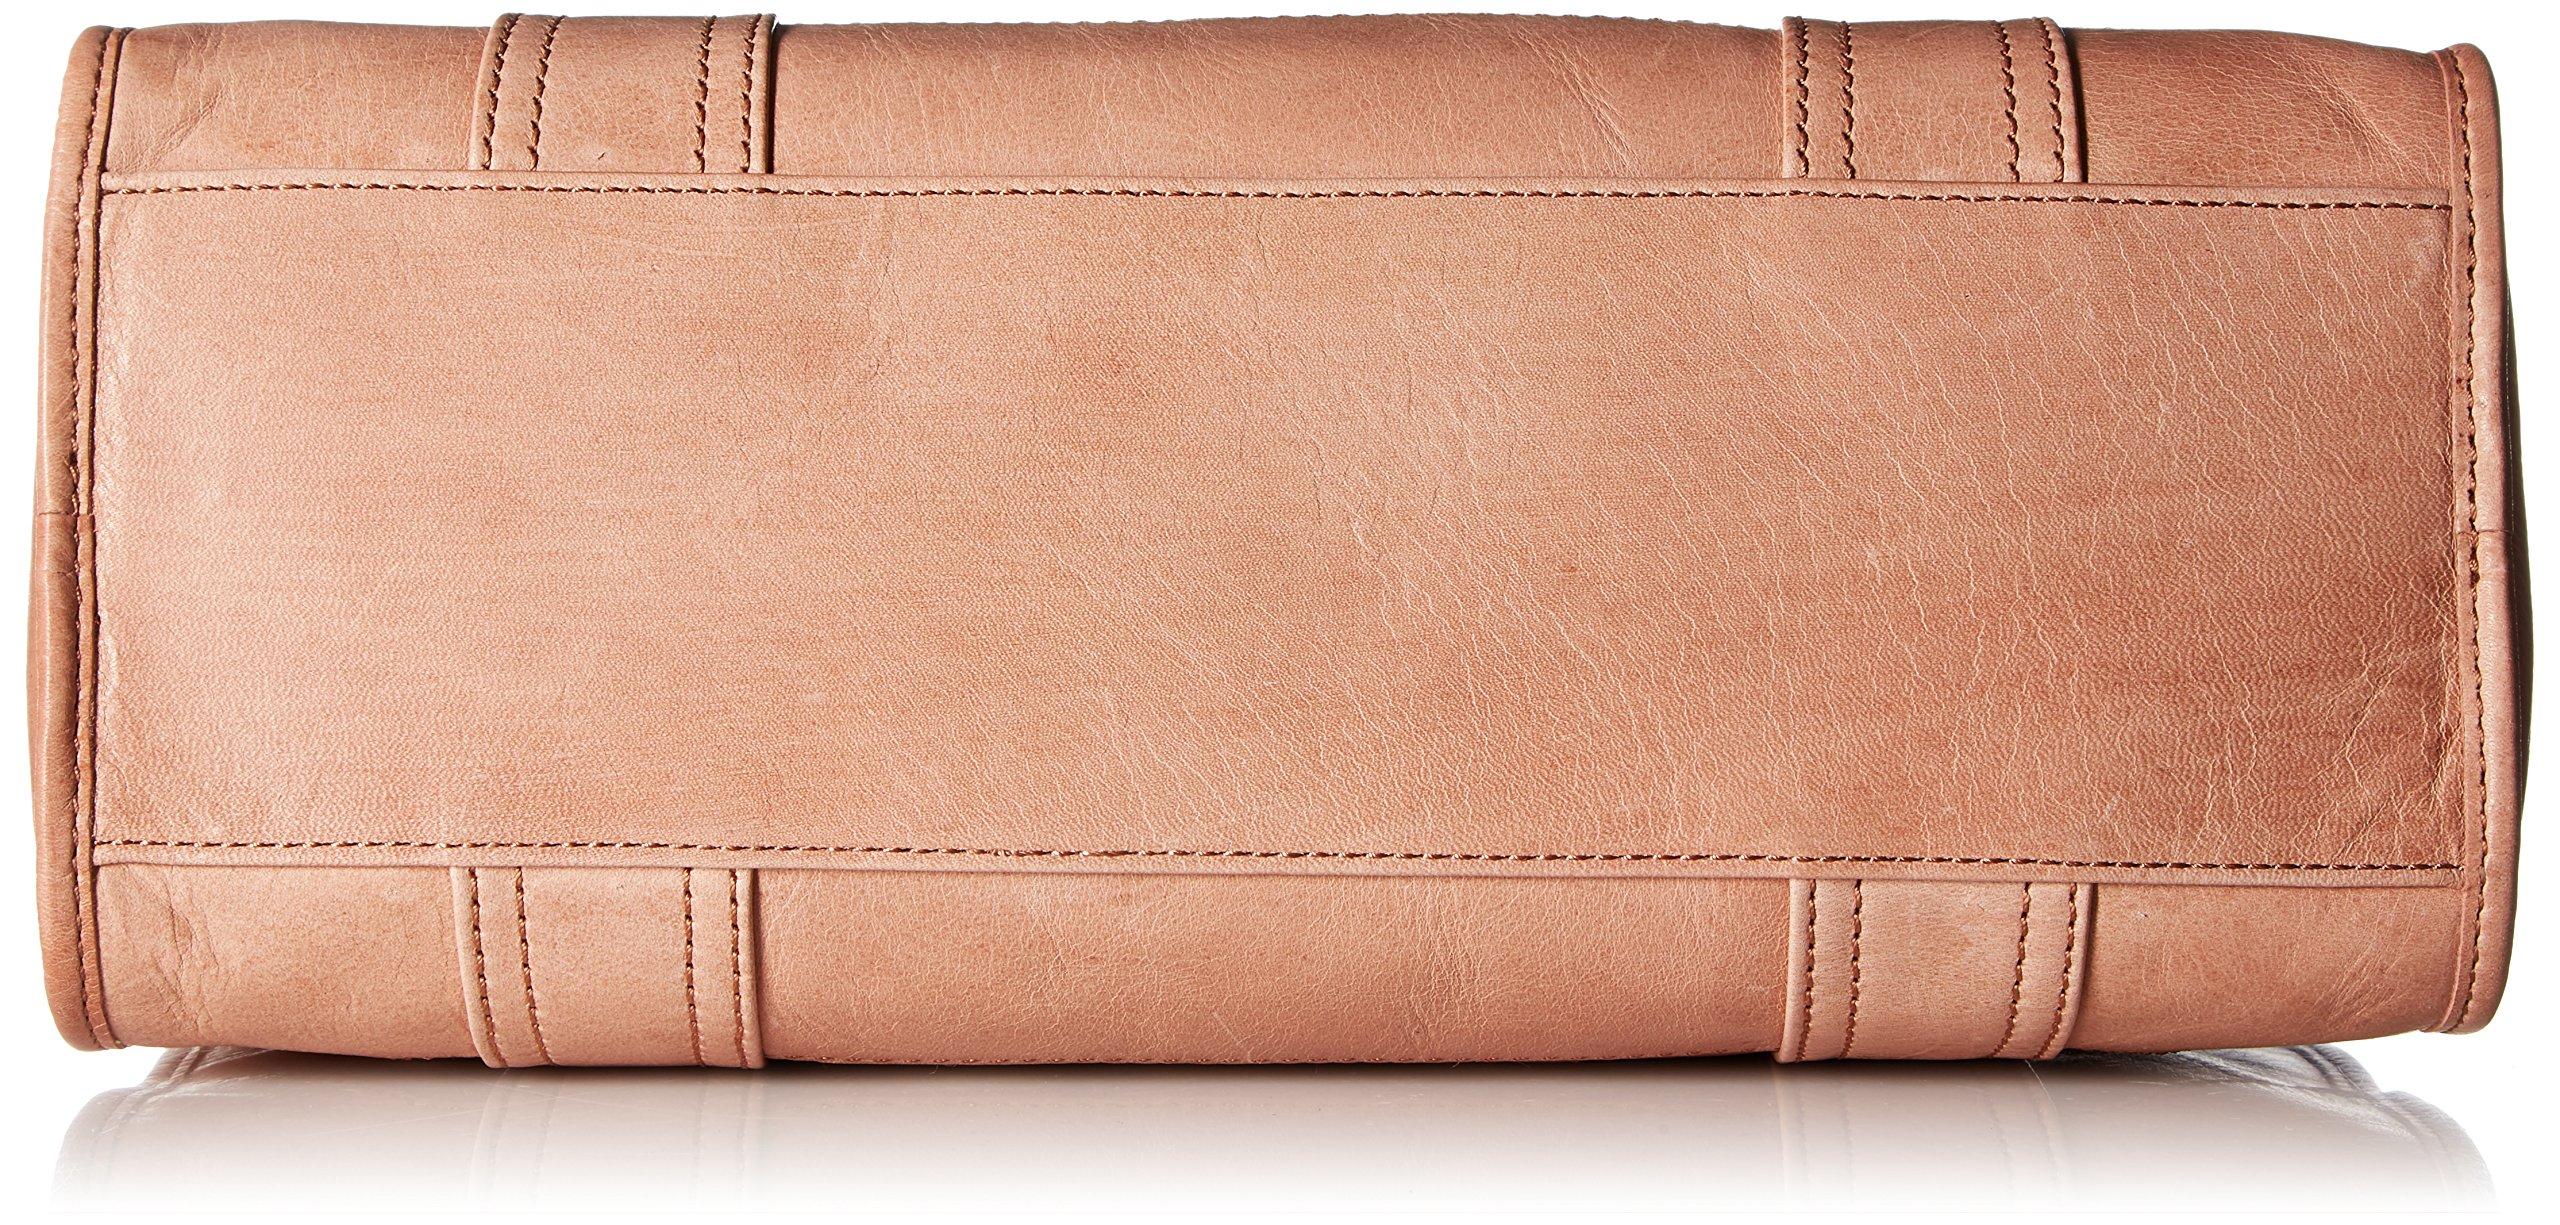 FRYE Melissa Zip Satchel Leather Handbag, dusty rose by FRYE (Image #4)